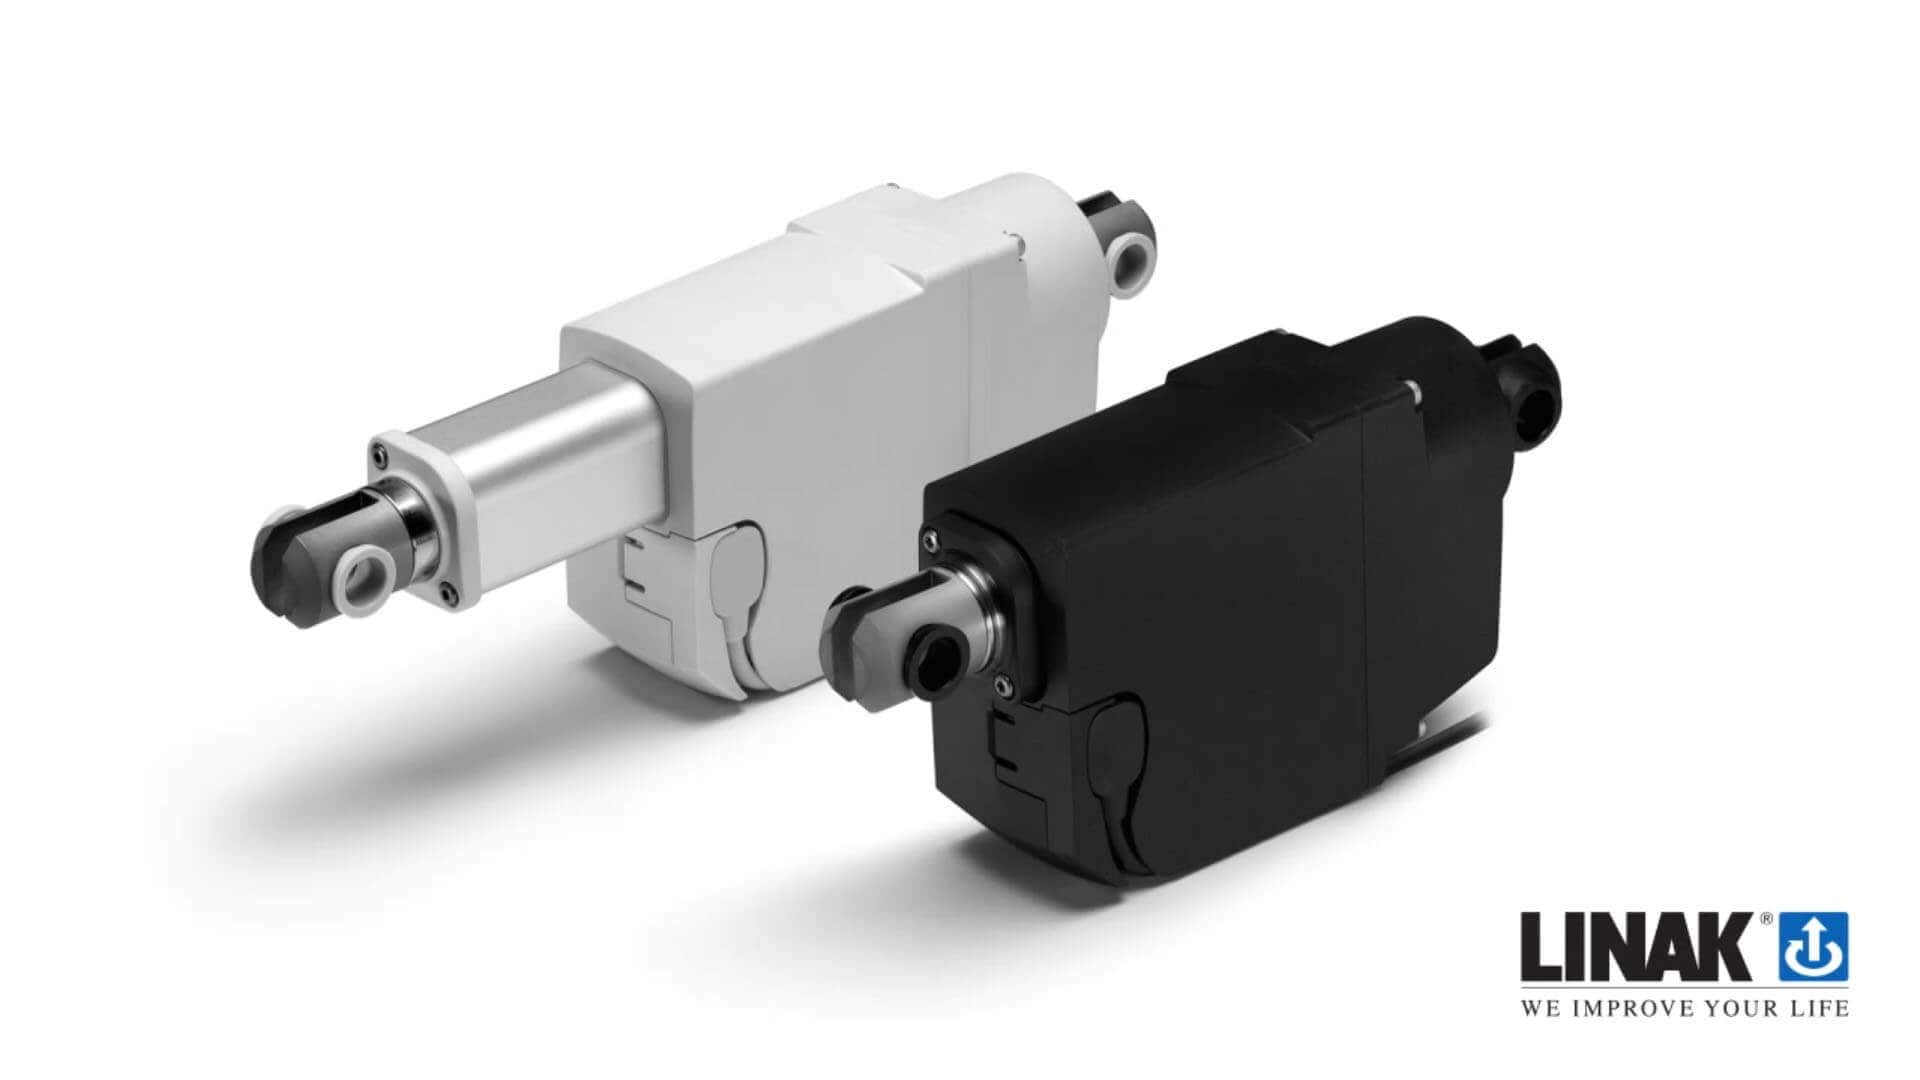 12 Volt Actuator Wiring Diagram Schematic Library Linak Linear Circuit Symbols U2022 Trolling Motor